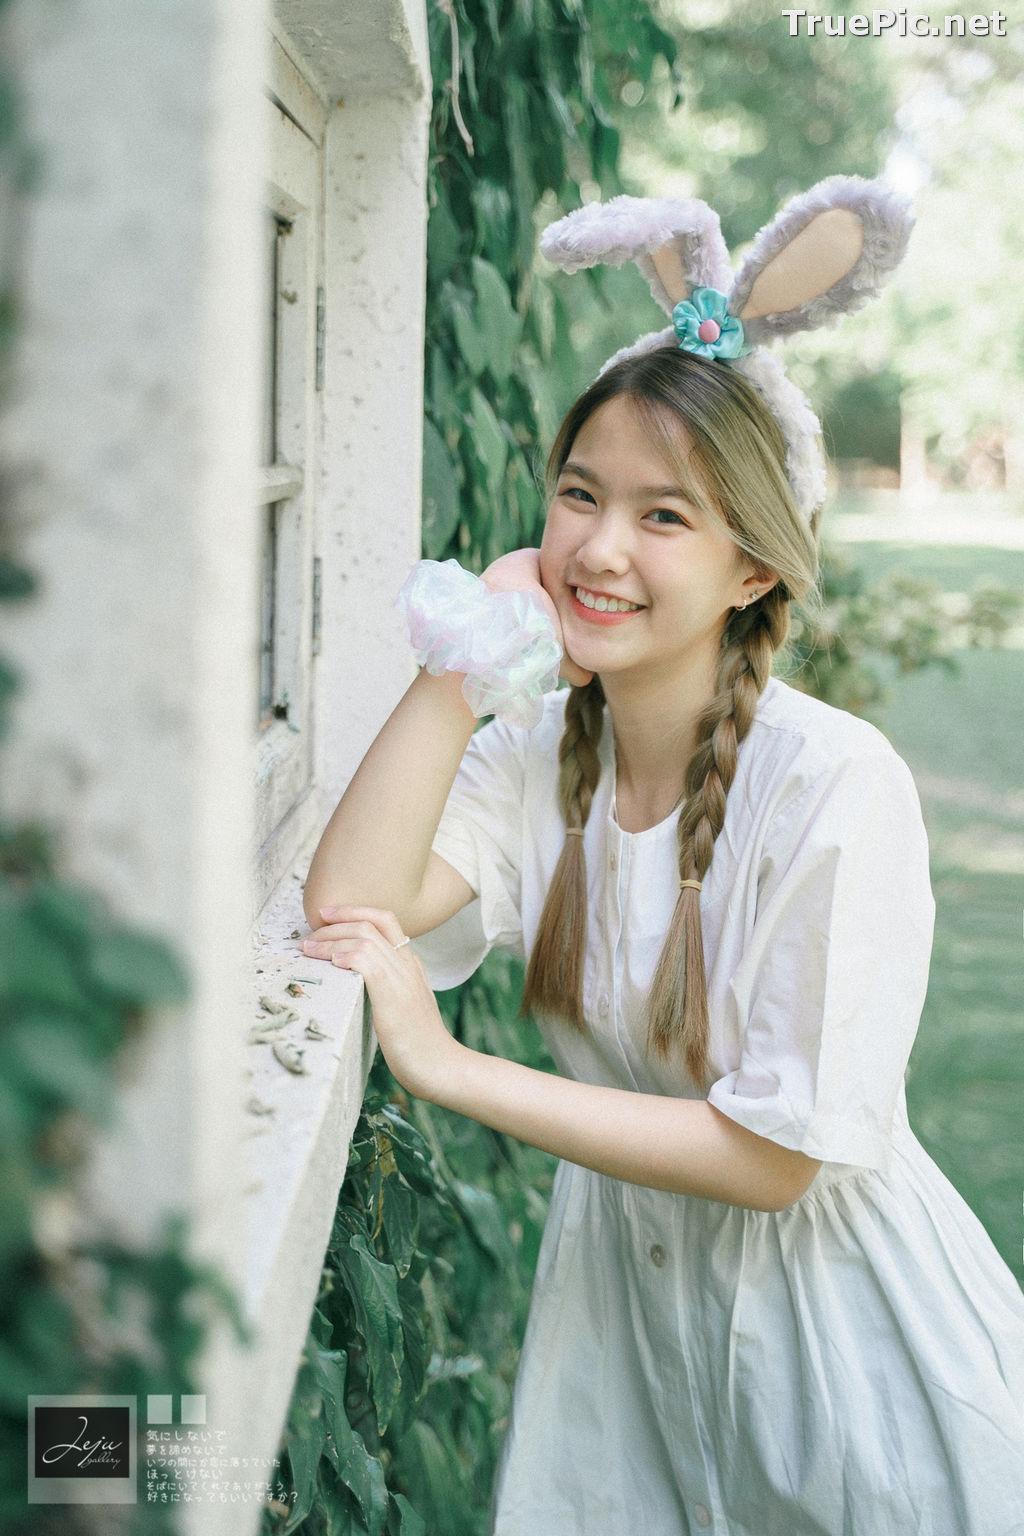 Image Thailand Cute Model - Napat Cdhg - Gam Bunny Girl - TruePic.net - Picture-2